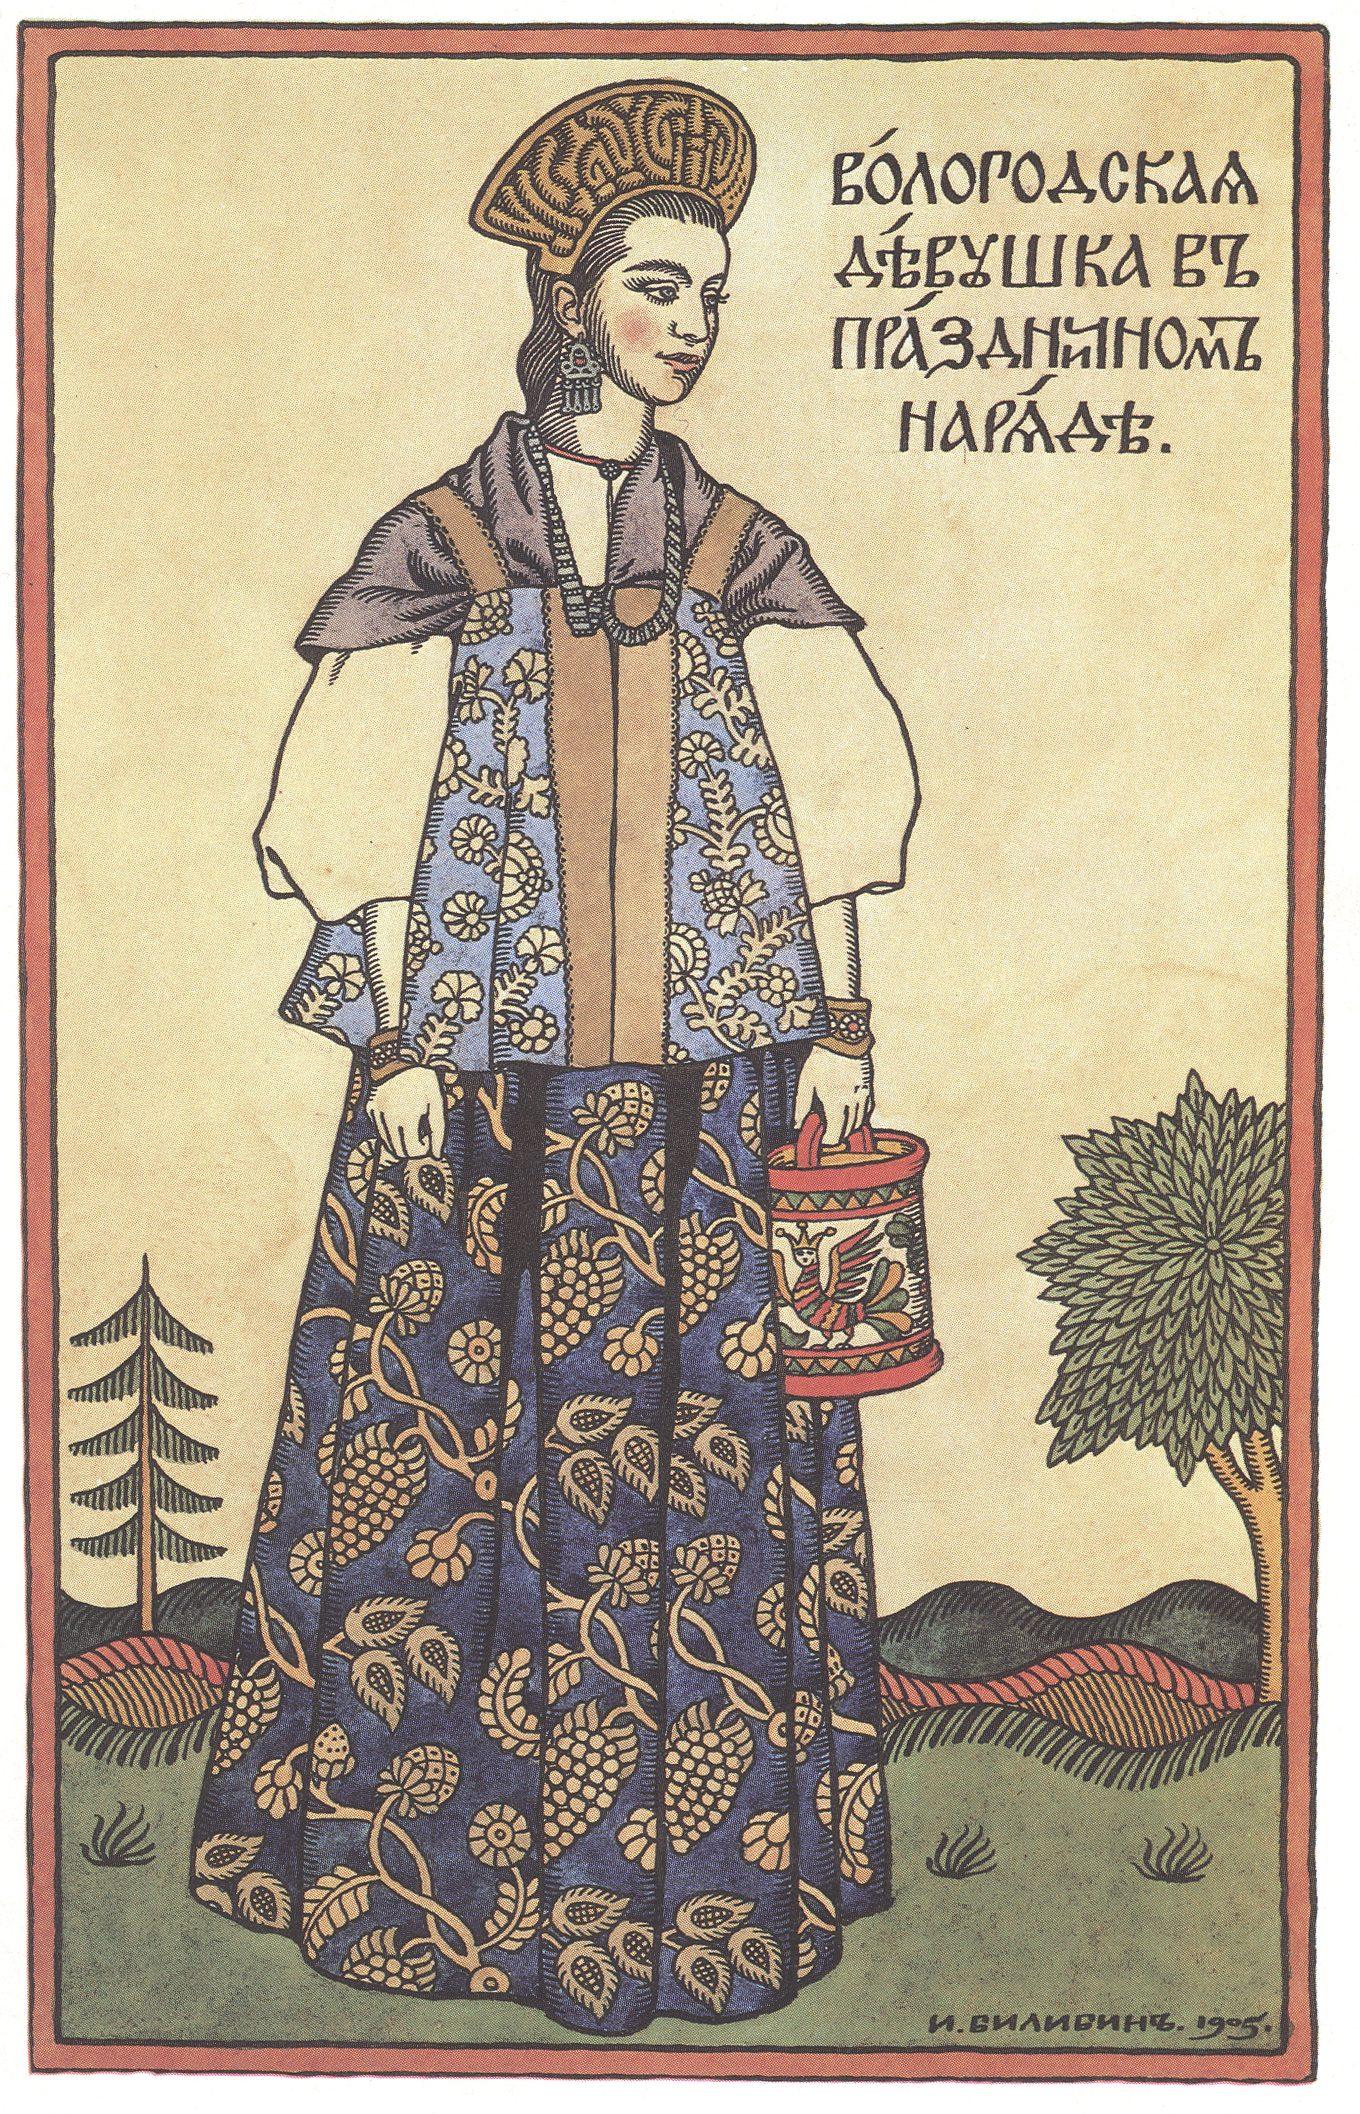 Ivan Bilibin - Vologda girl in holiday dress 1905